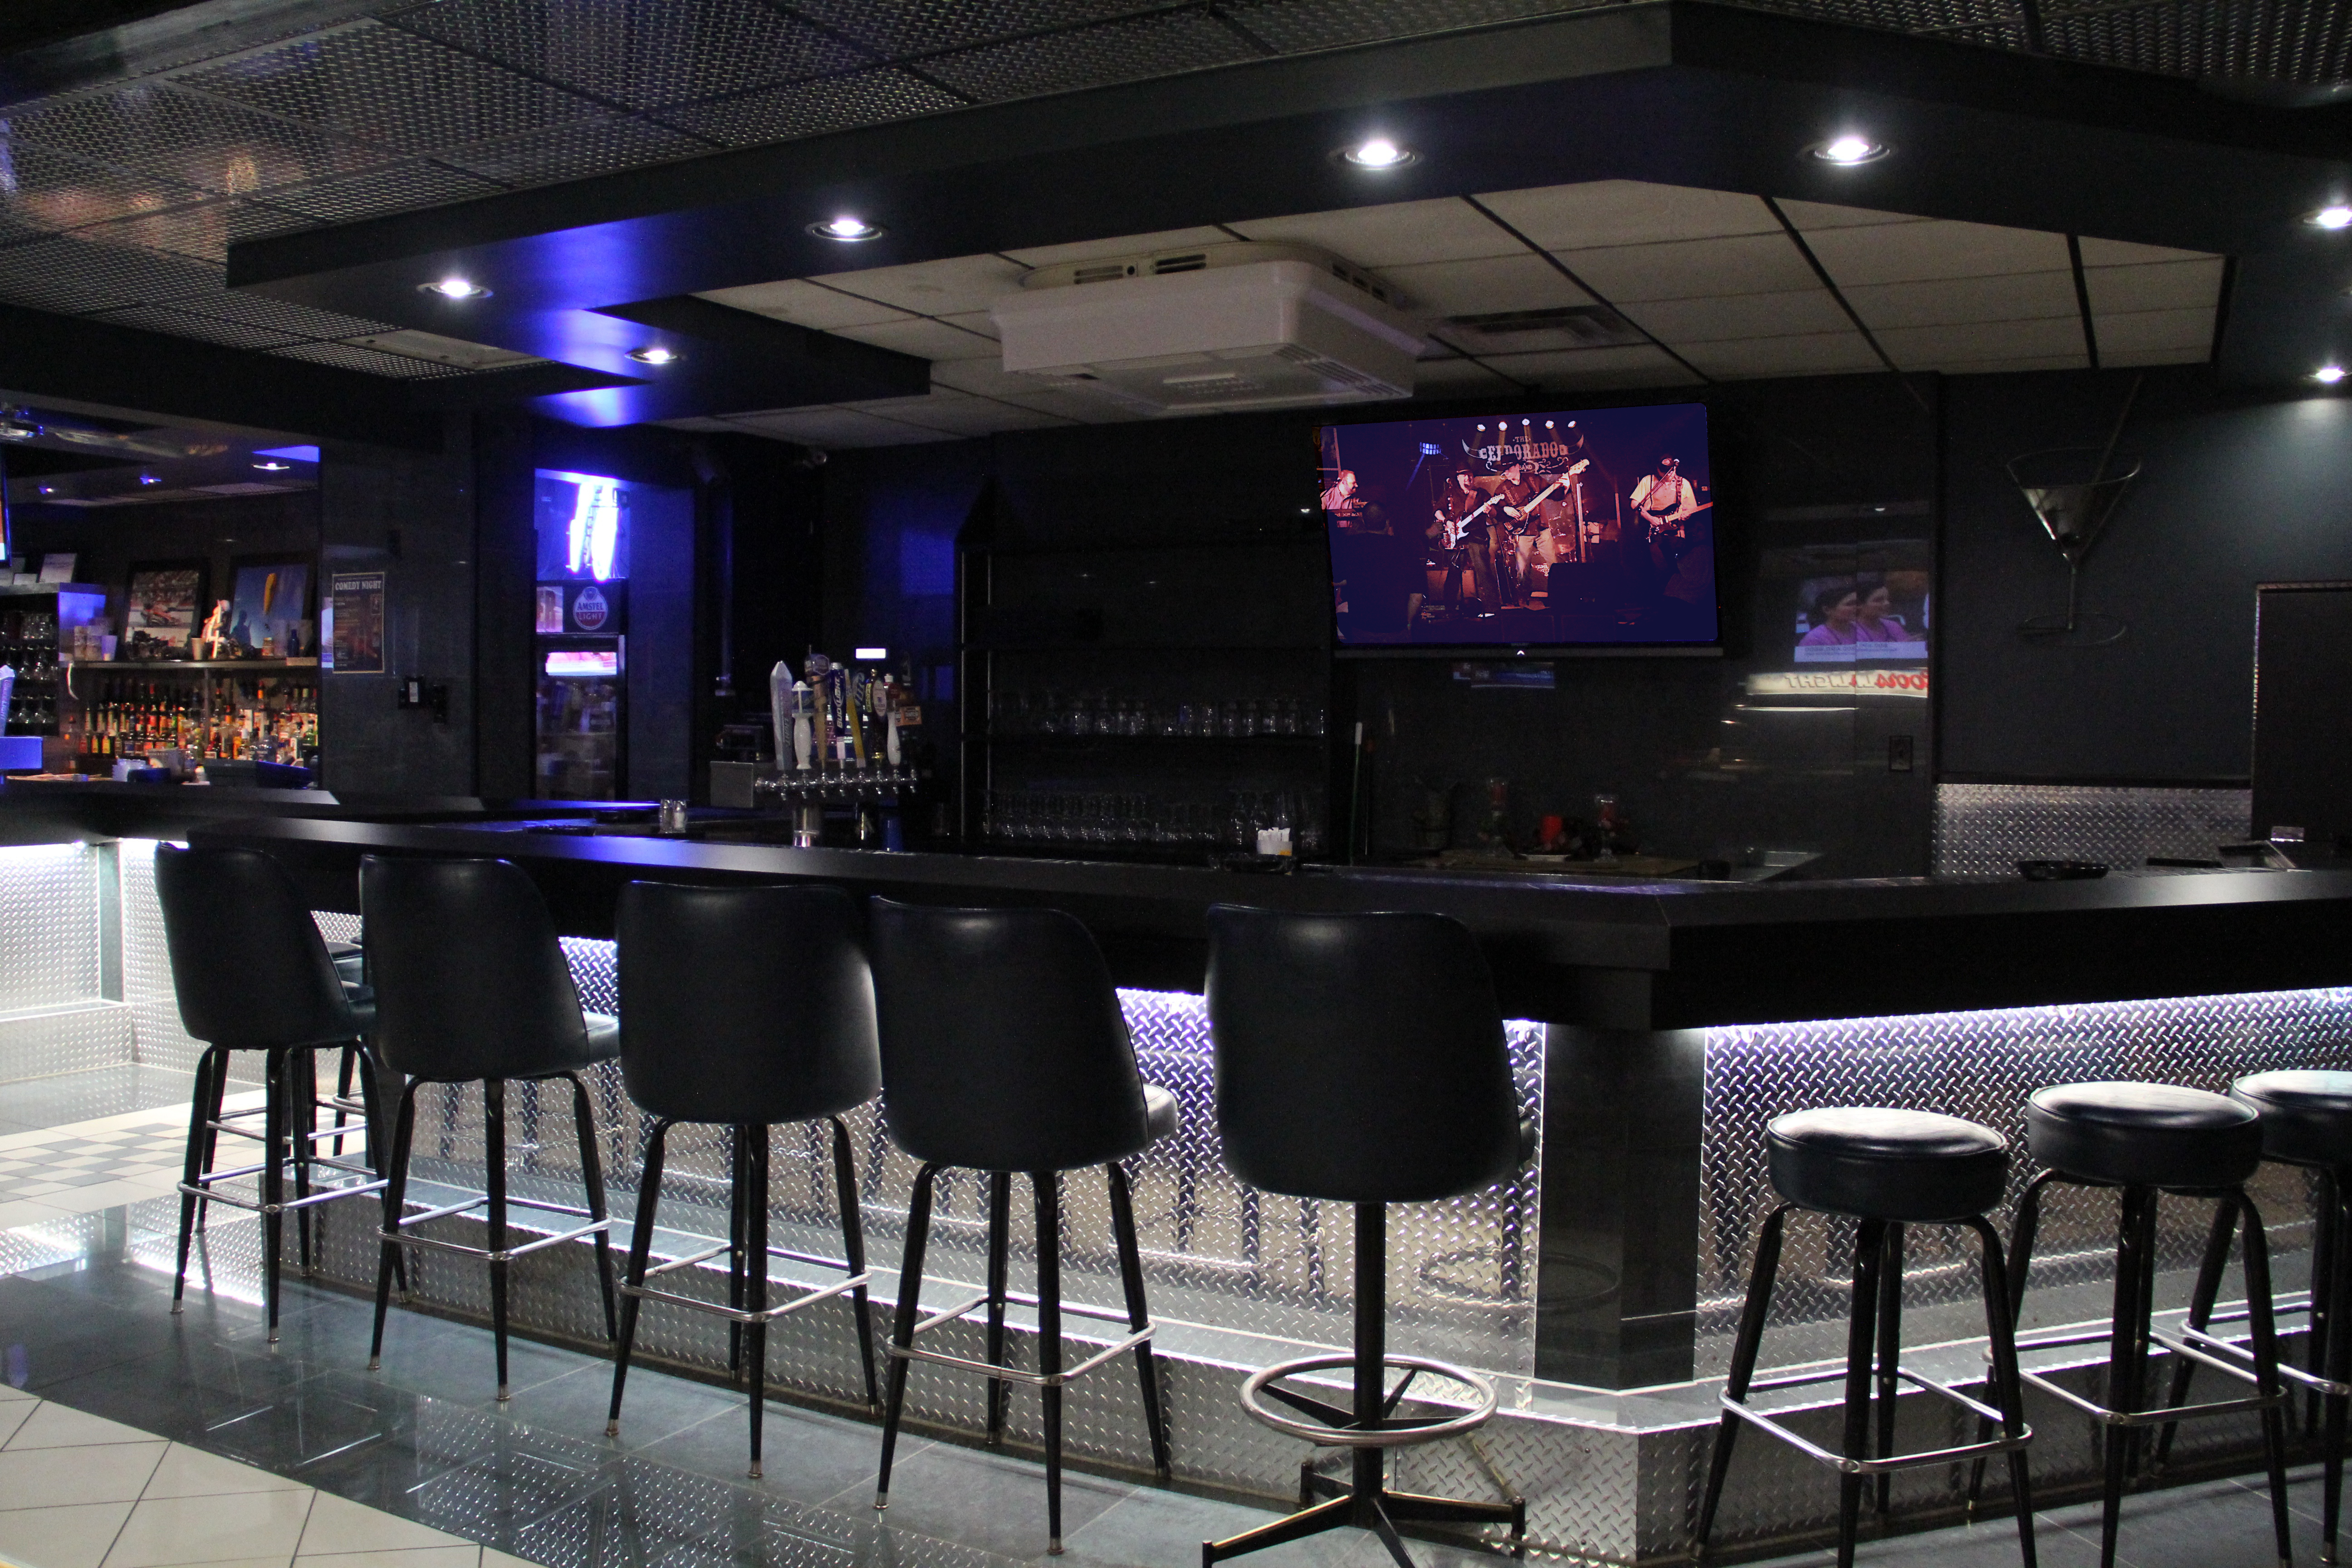 Xlerator Bar & Grille, Beaver Falls PA